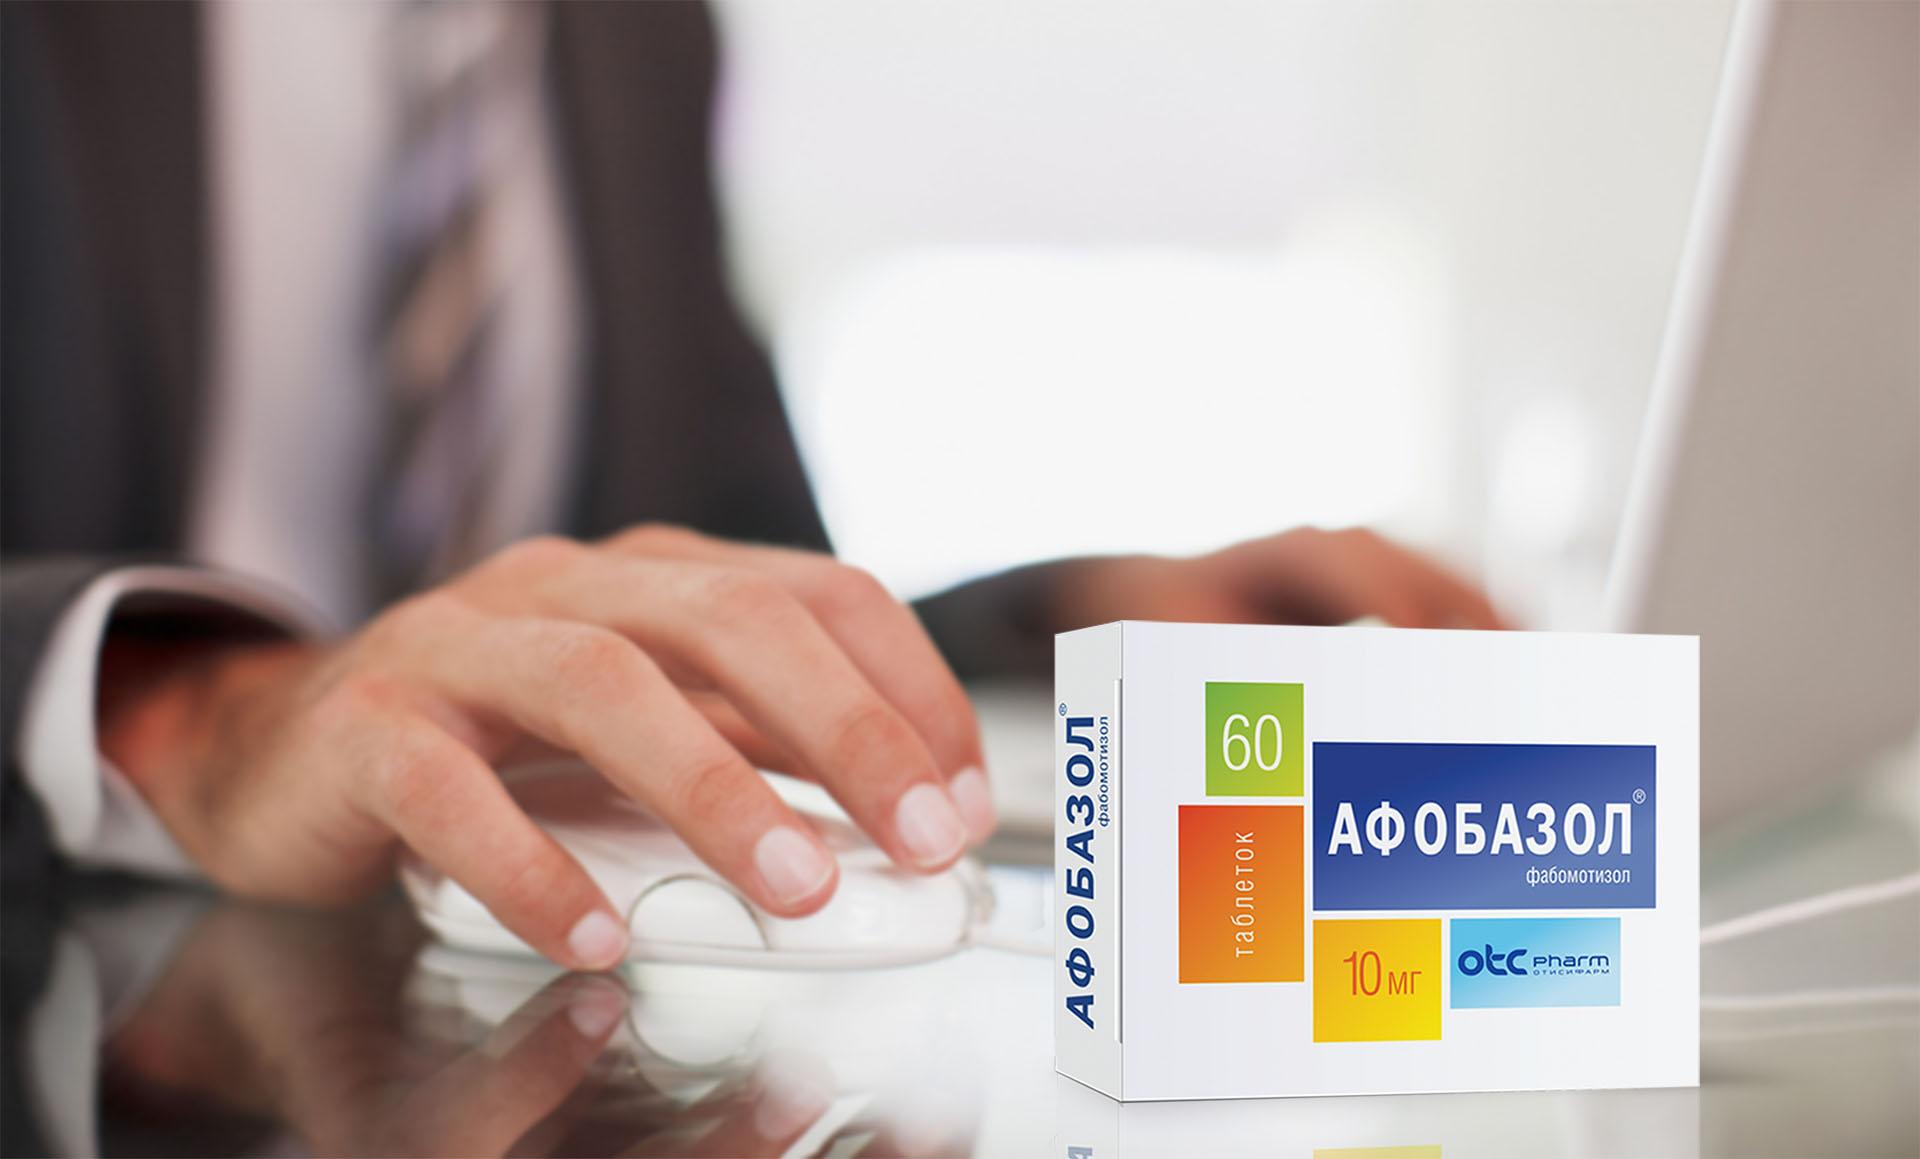 Development дизайна упаковки фармацевтического препарата